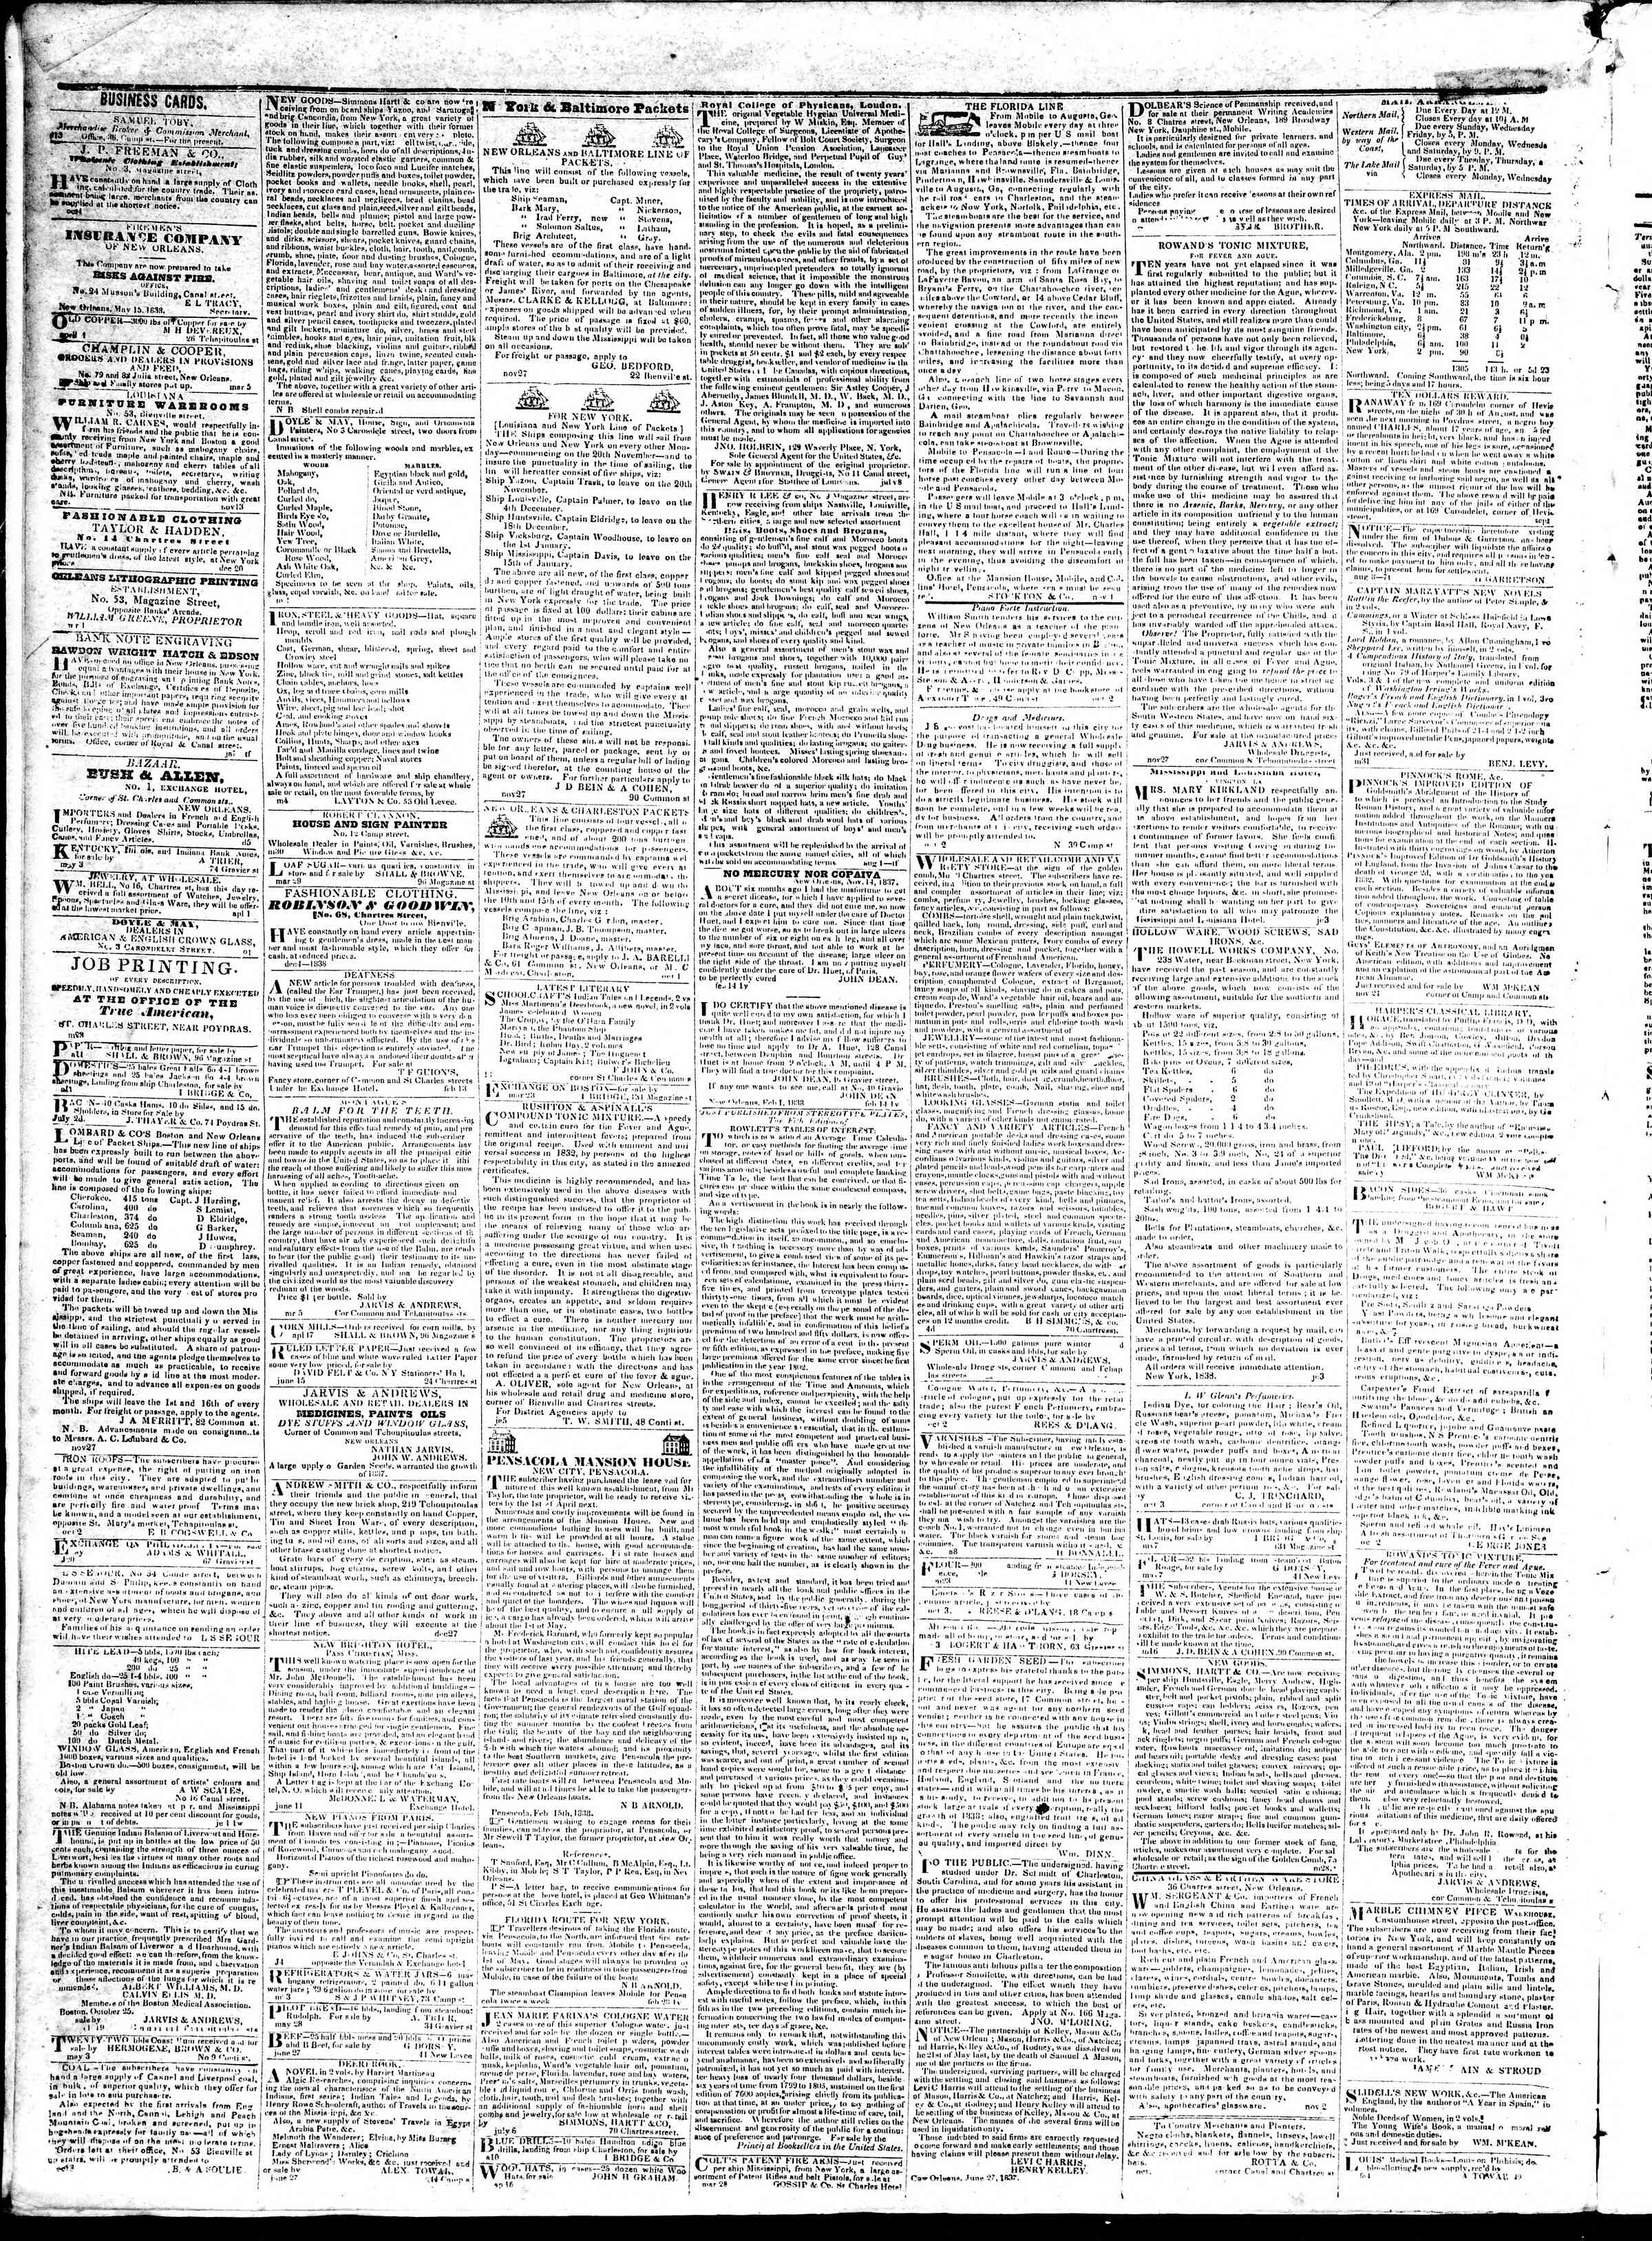 September 26, 1839 Tarihli True American Gazetesi Sayfa 4